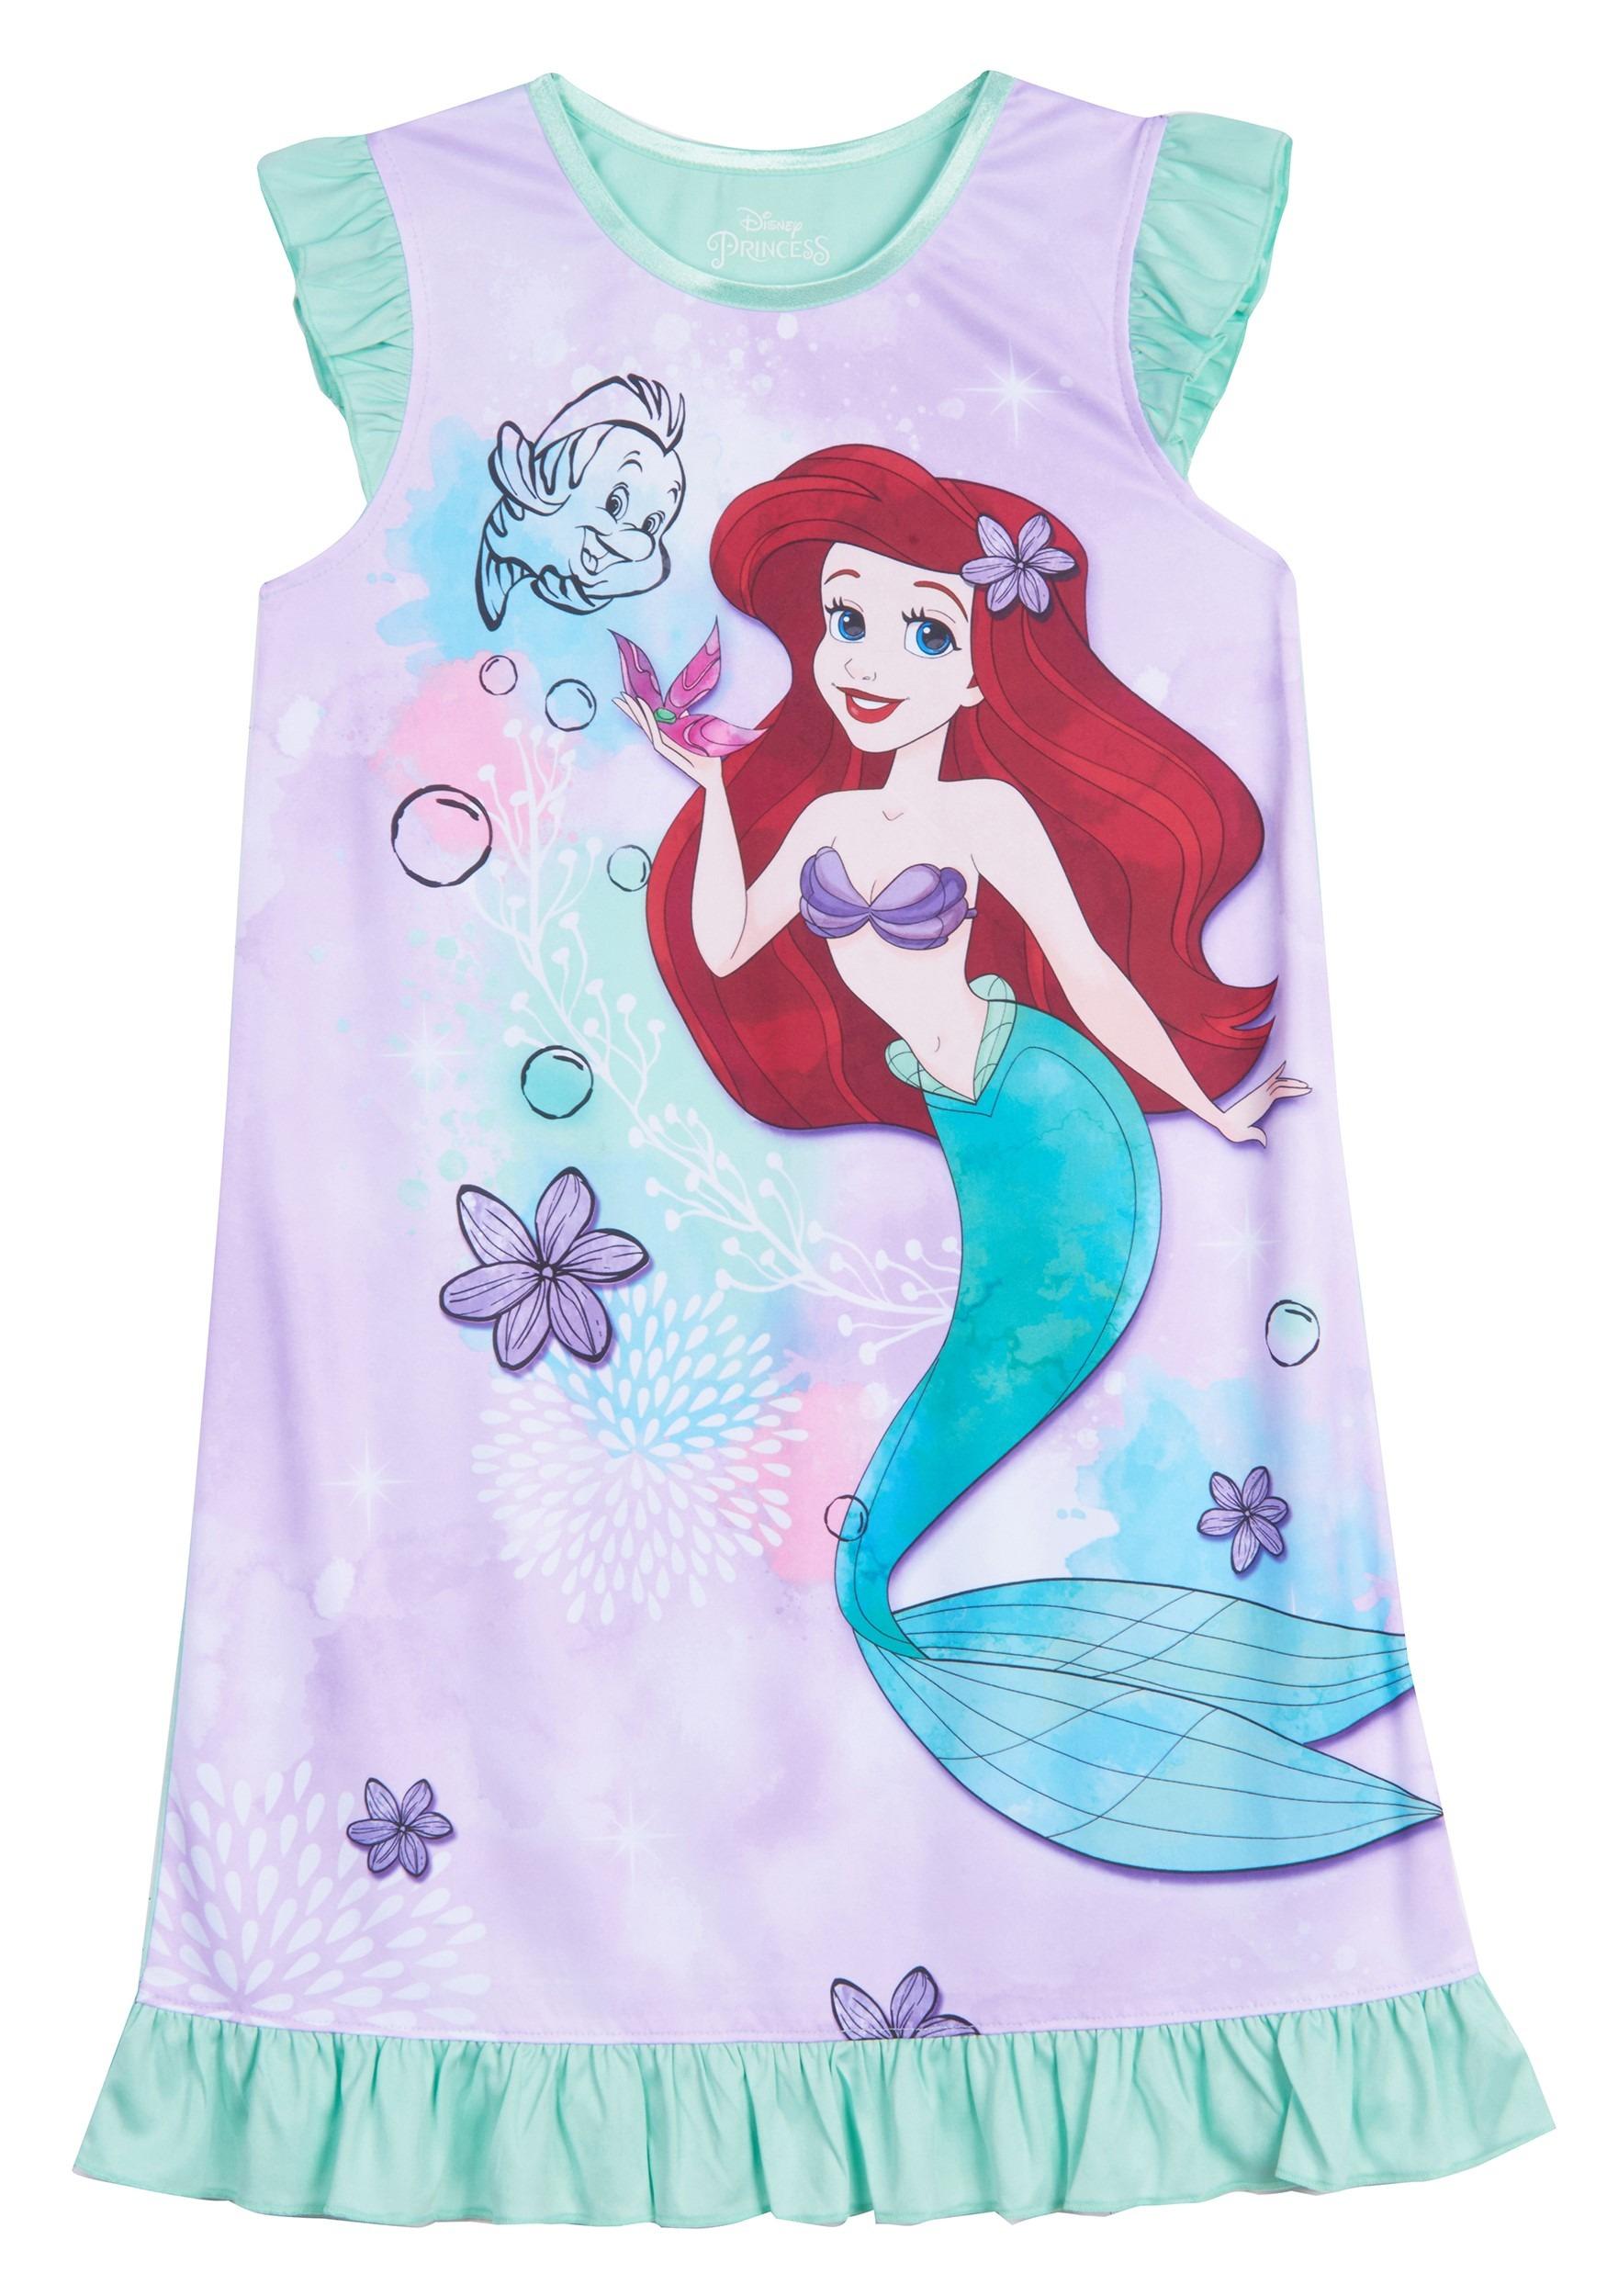 Ariel Dorm Nightgown Girls Disney